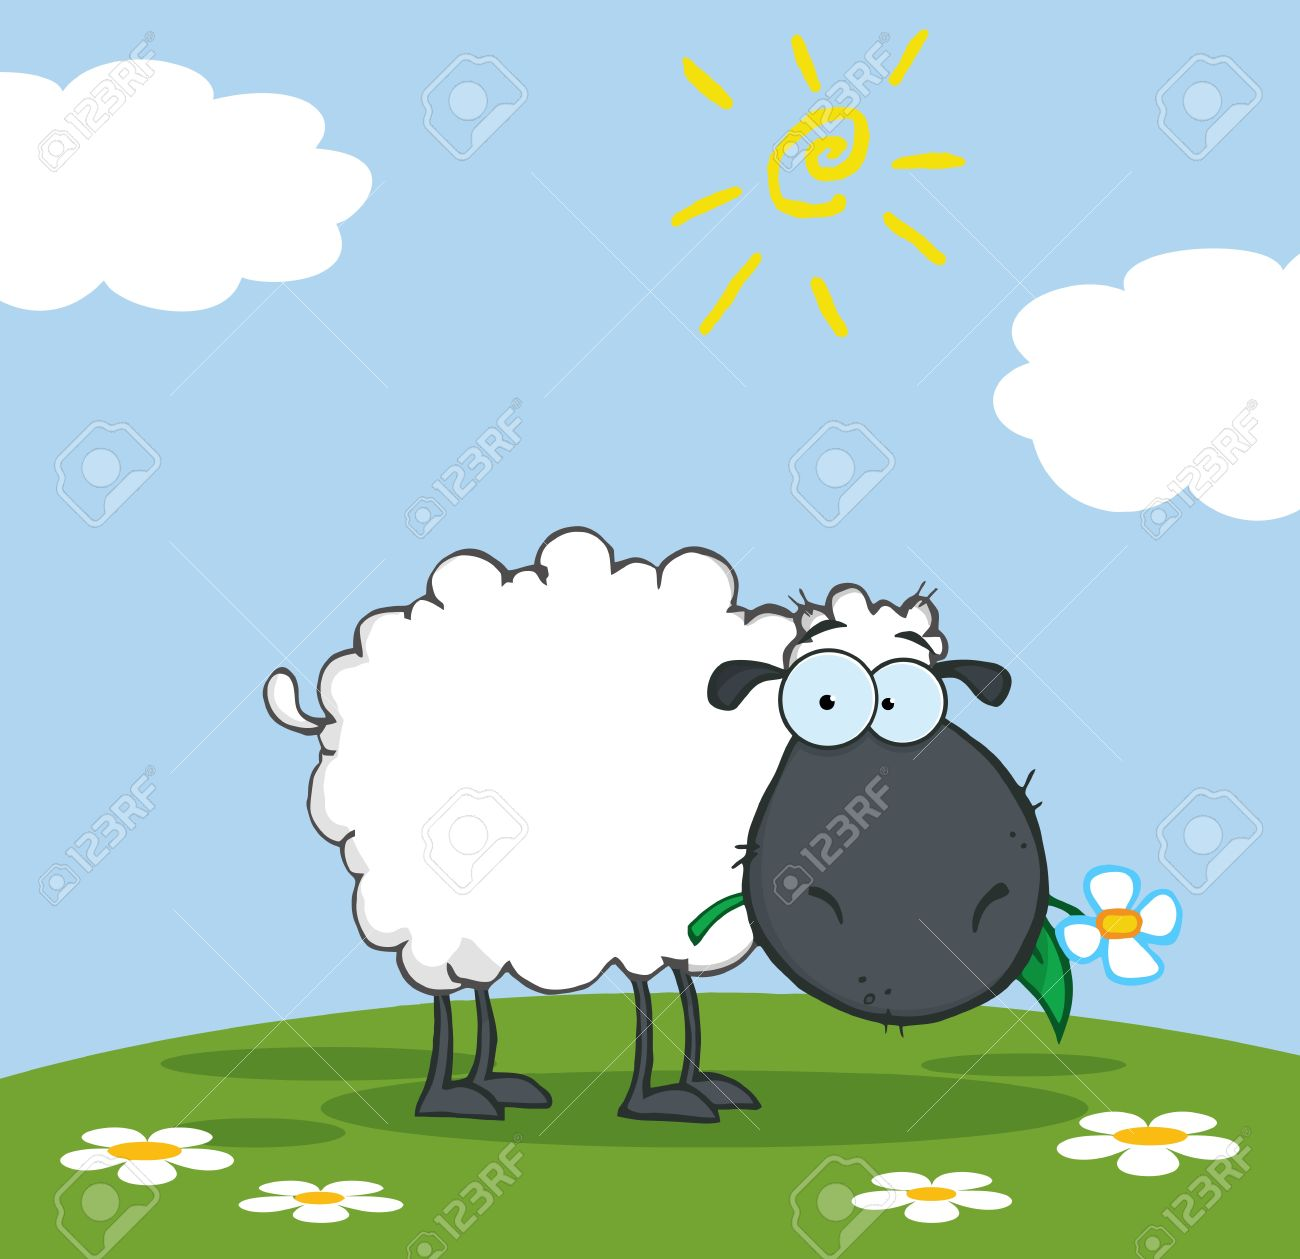 sheep cartoon stock photos royalty free sheep cartoon images and